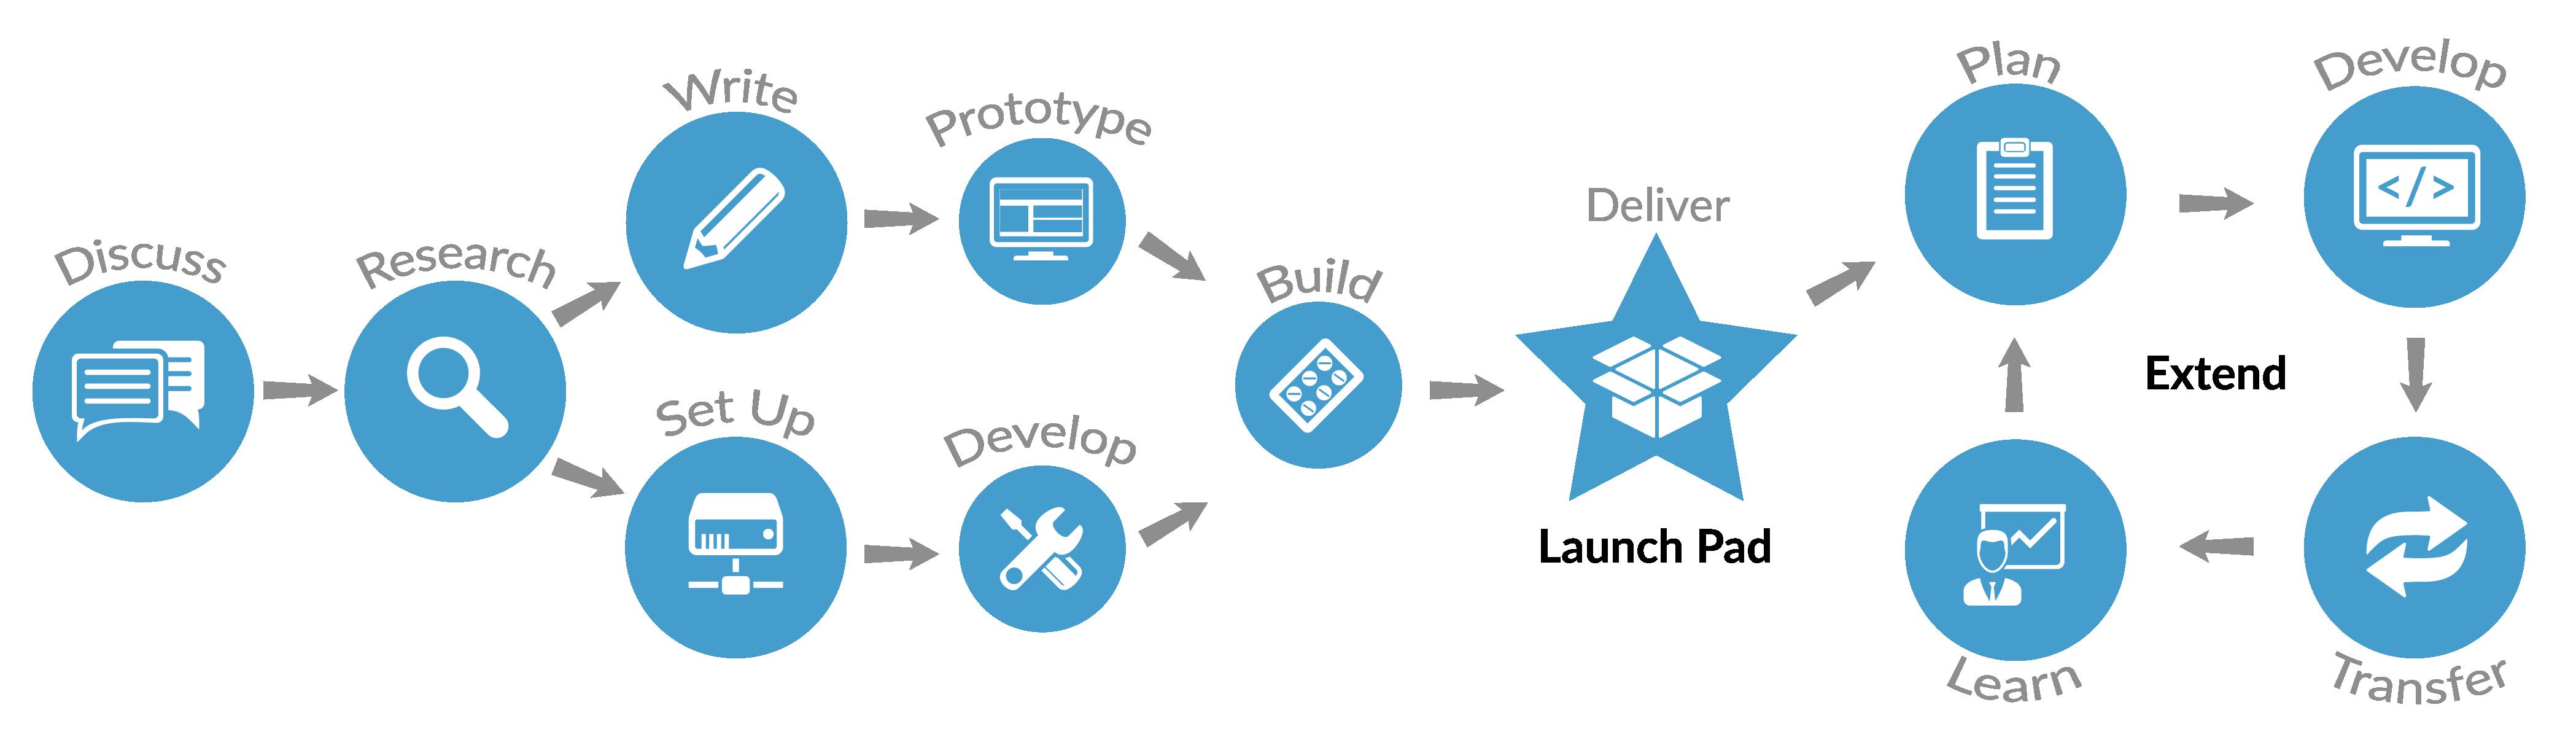 web_dev_process-01